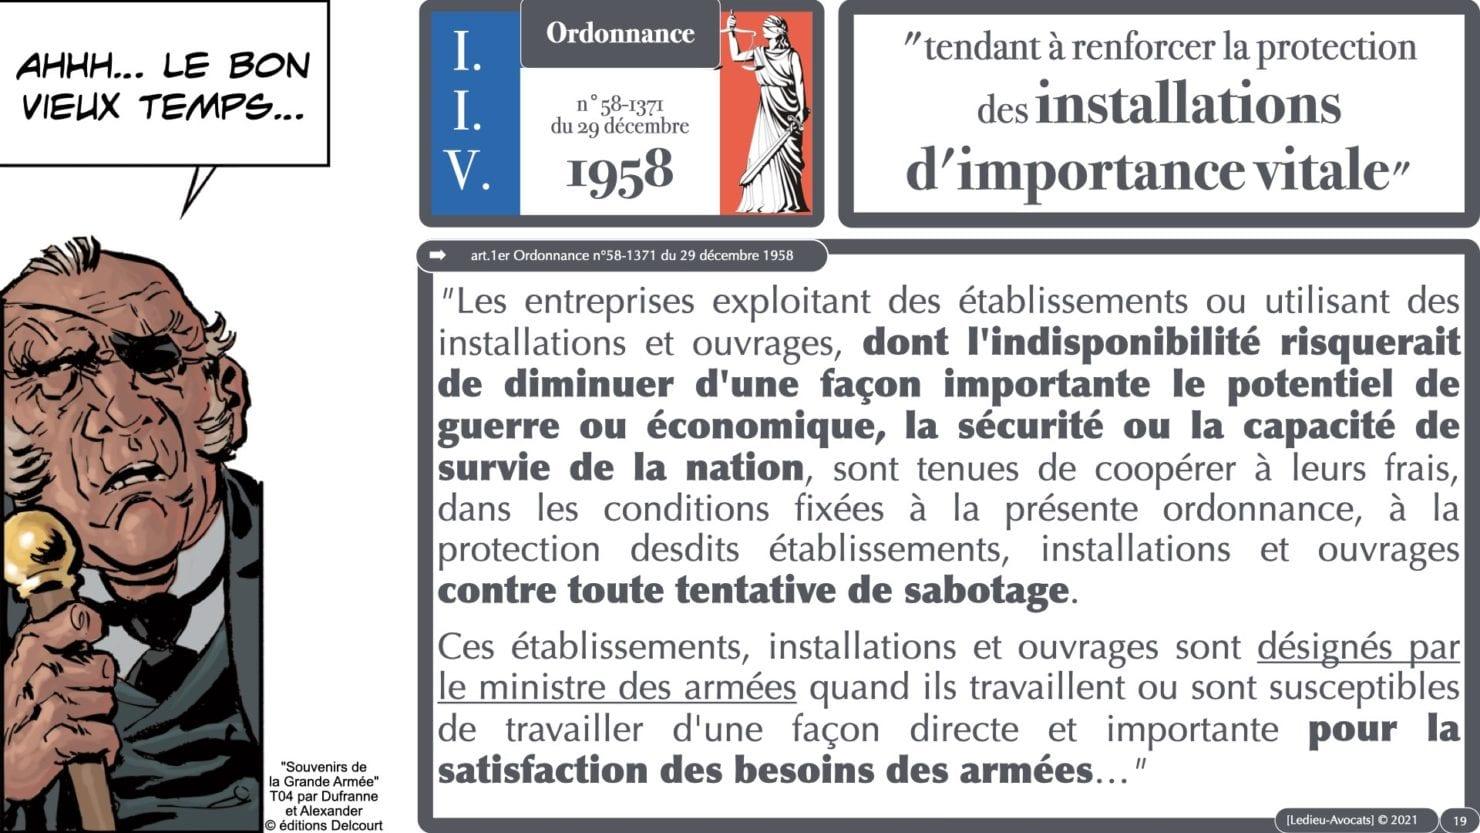 337 cyber sécurité #1 OIV OSE Critical Entities © Ledieu-avocat 15-06-2021.019